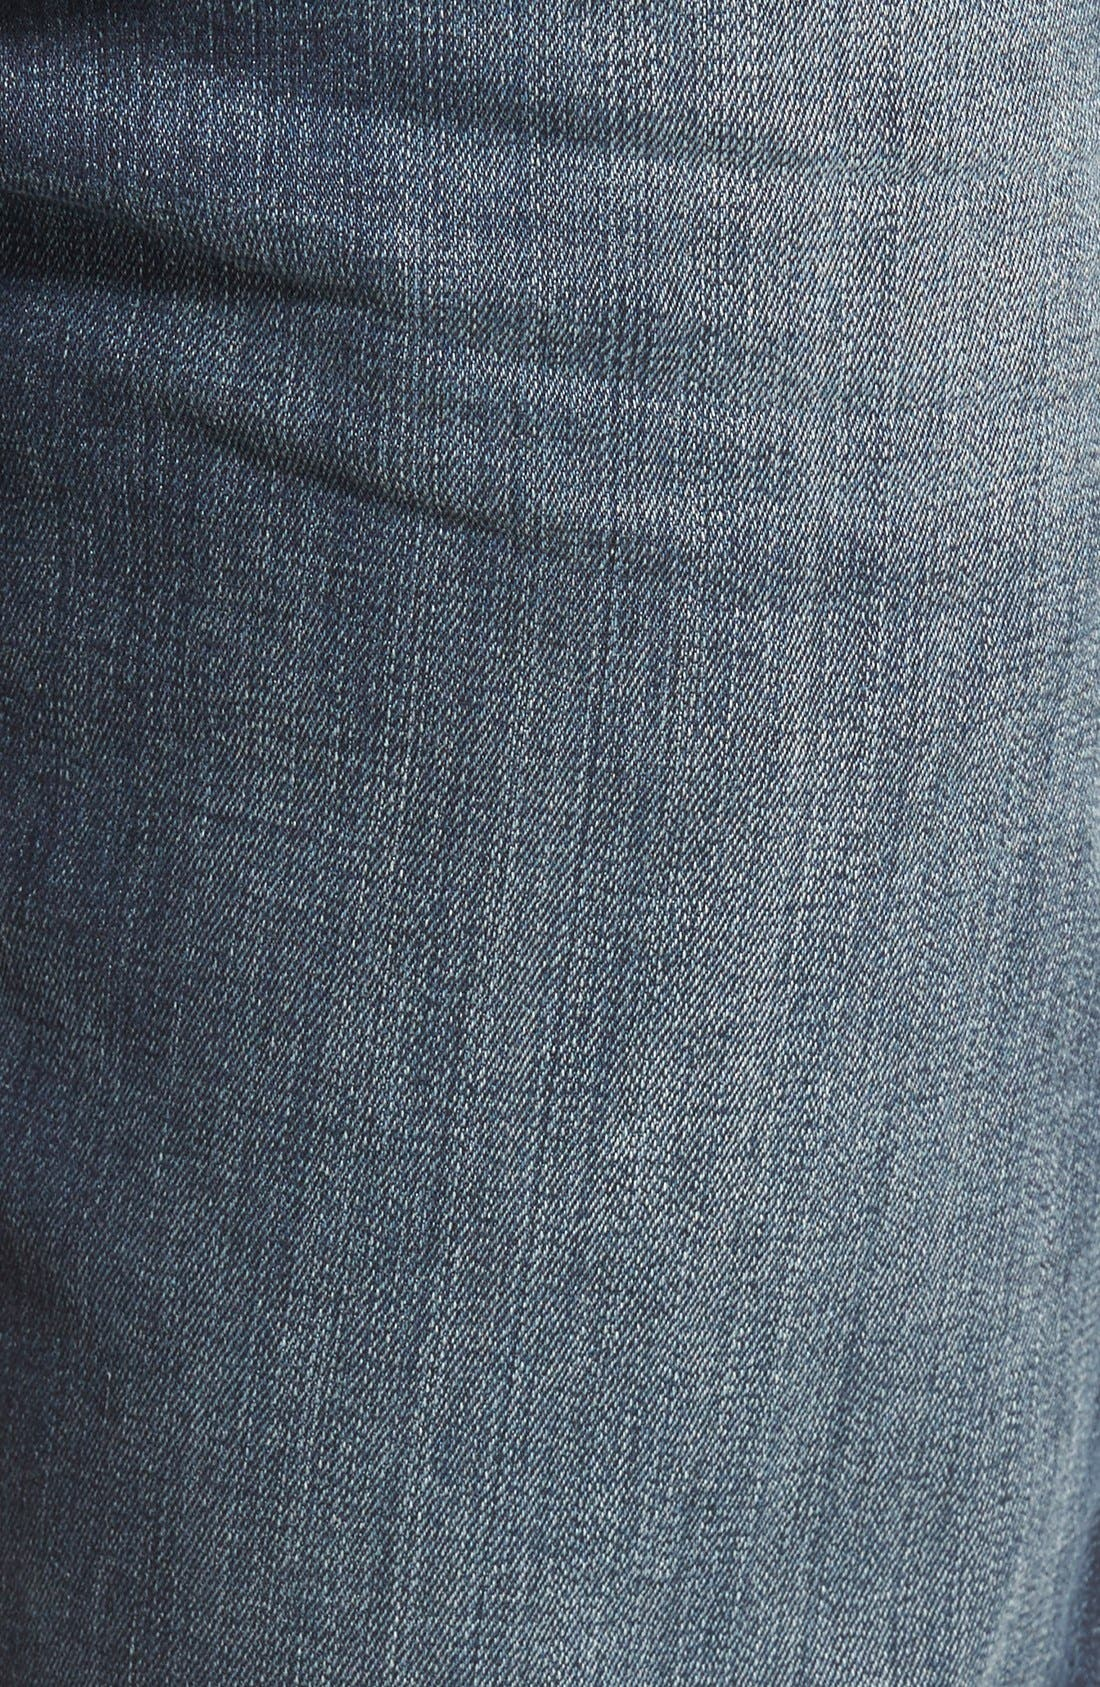 MAVI JEANS,                             Zach Straight Leg Jeans,                             Alternate thumbnail 8, color,                             DARK BRUSHED WILLIAMSBURG